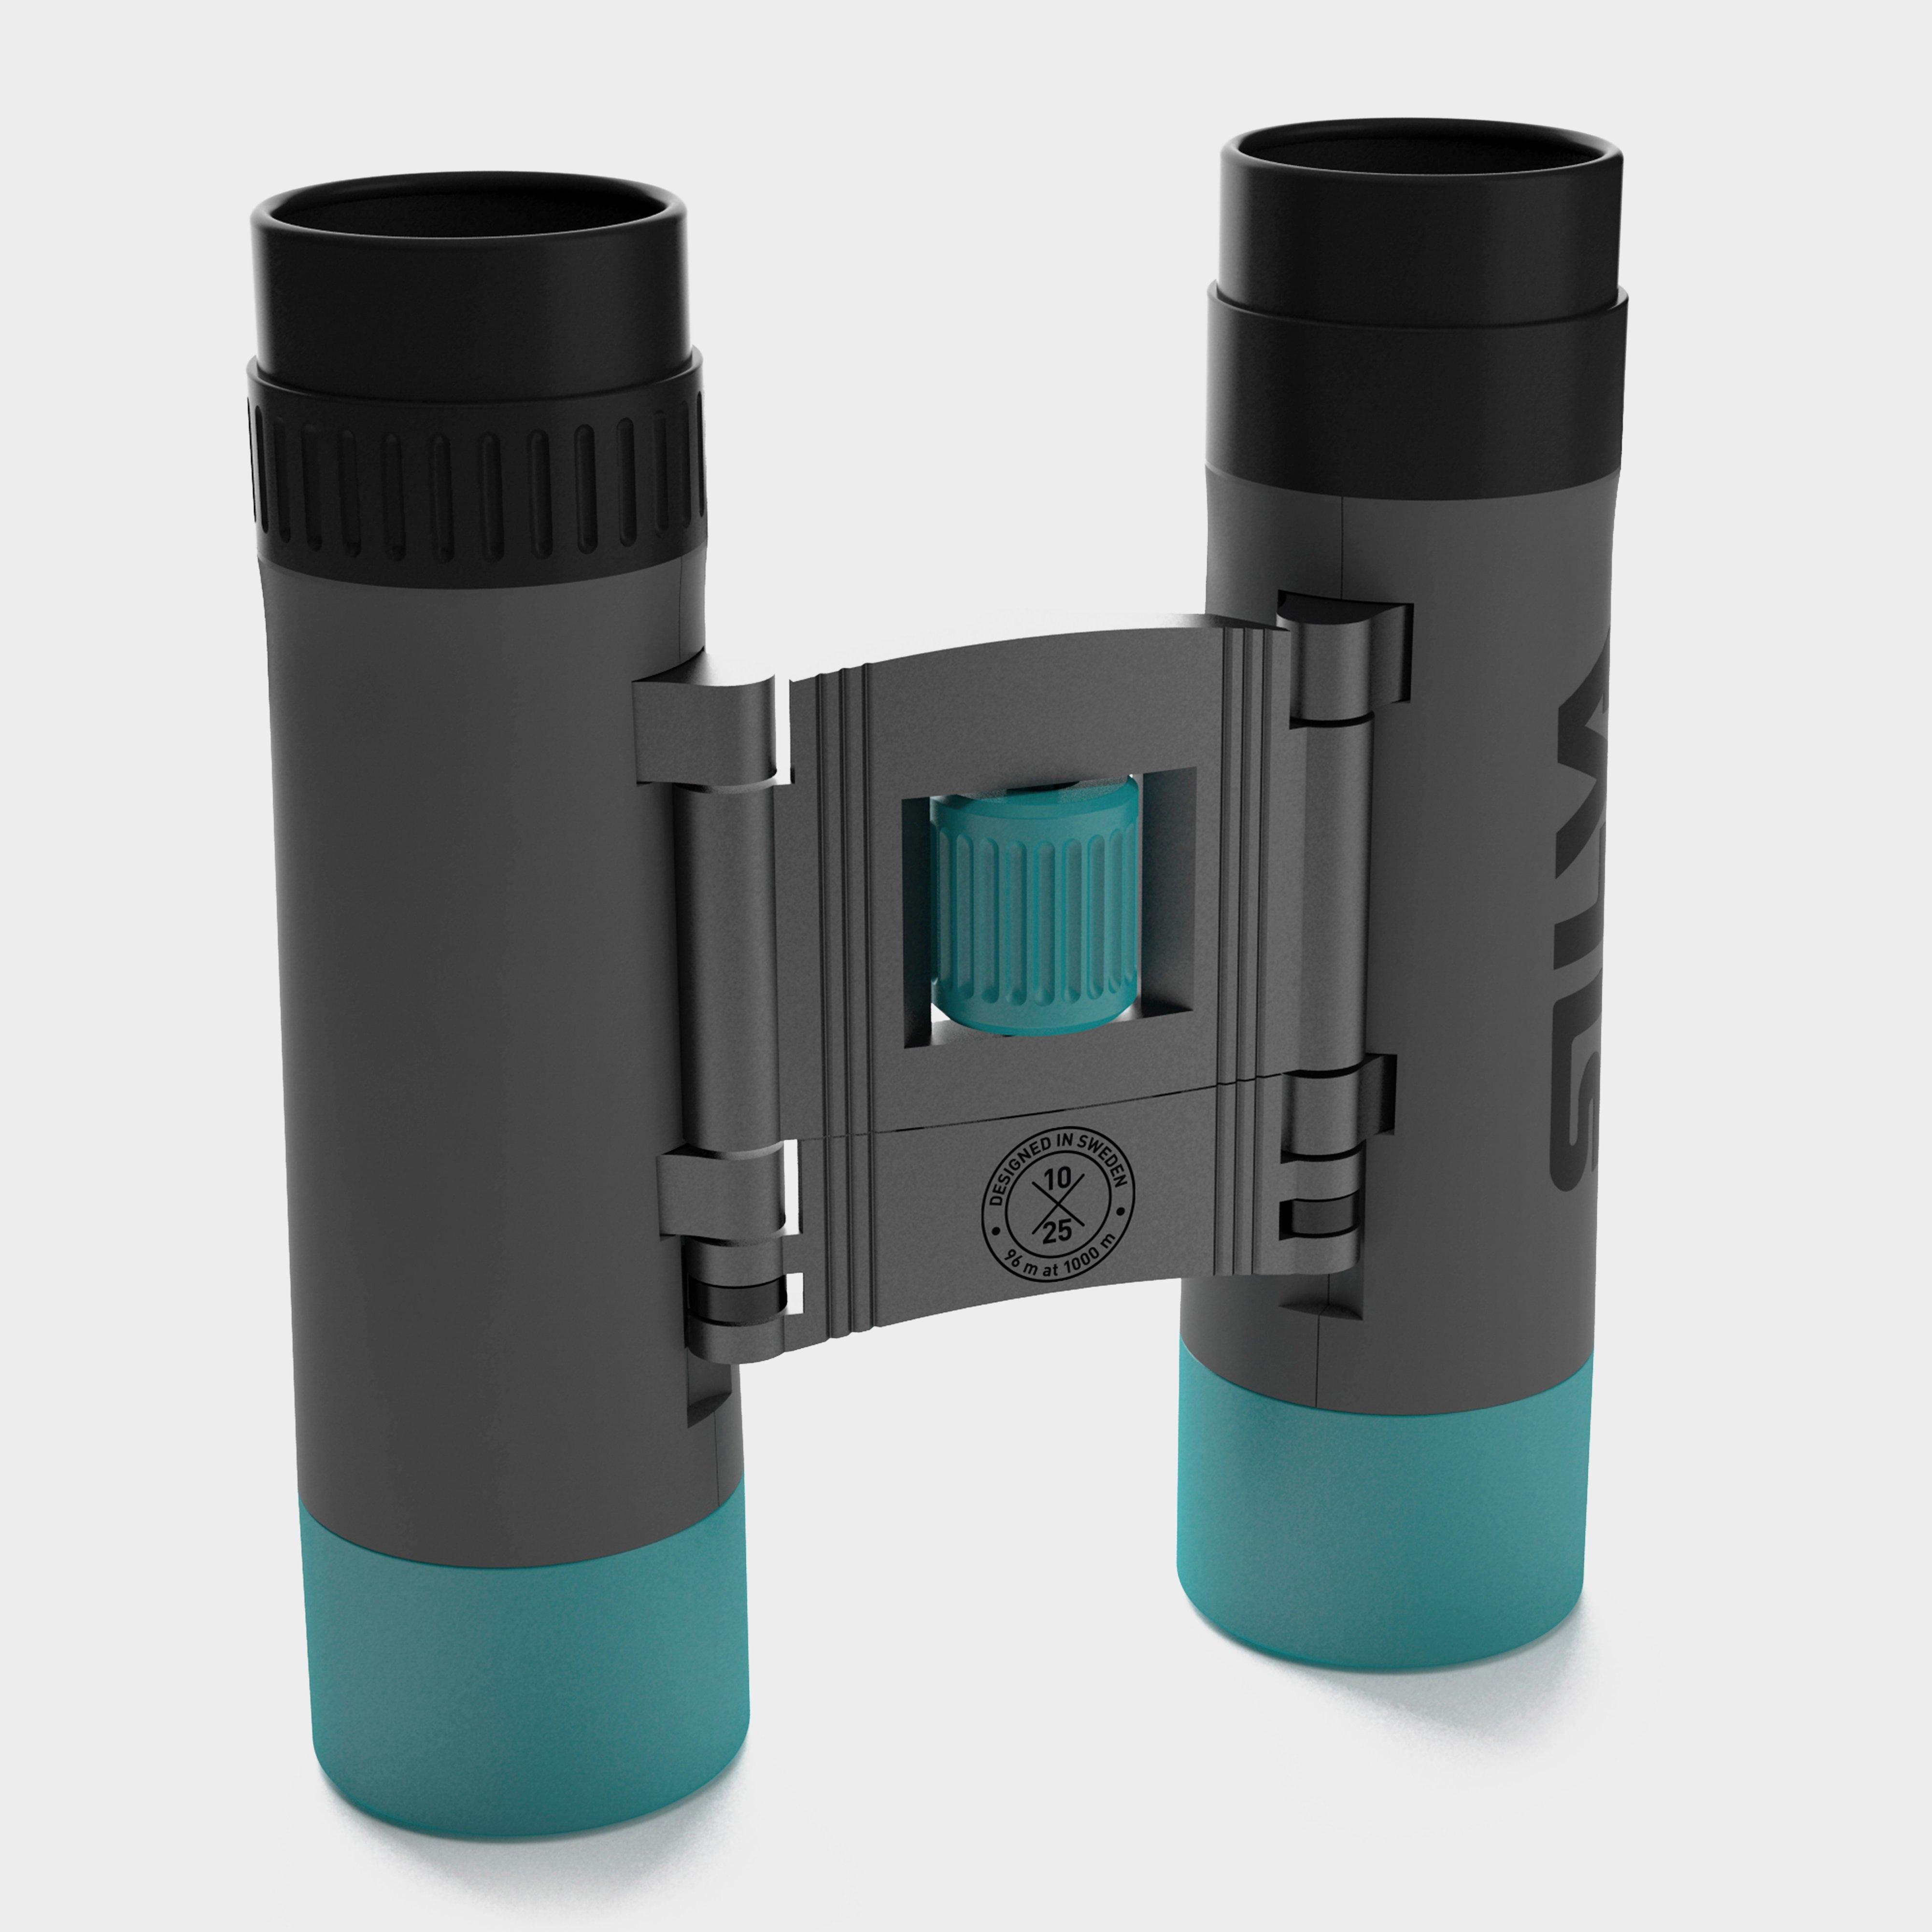 Silva Pocket 10x Binocular - Black/binocular  Black/binocular